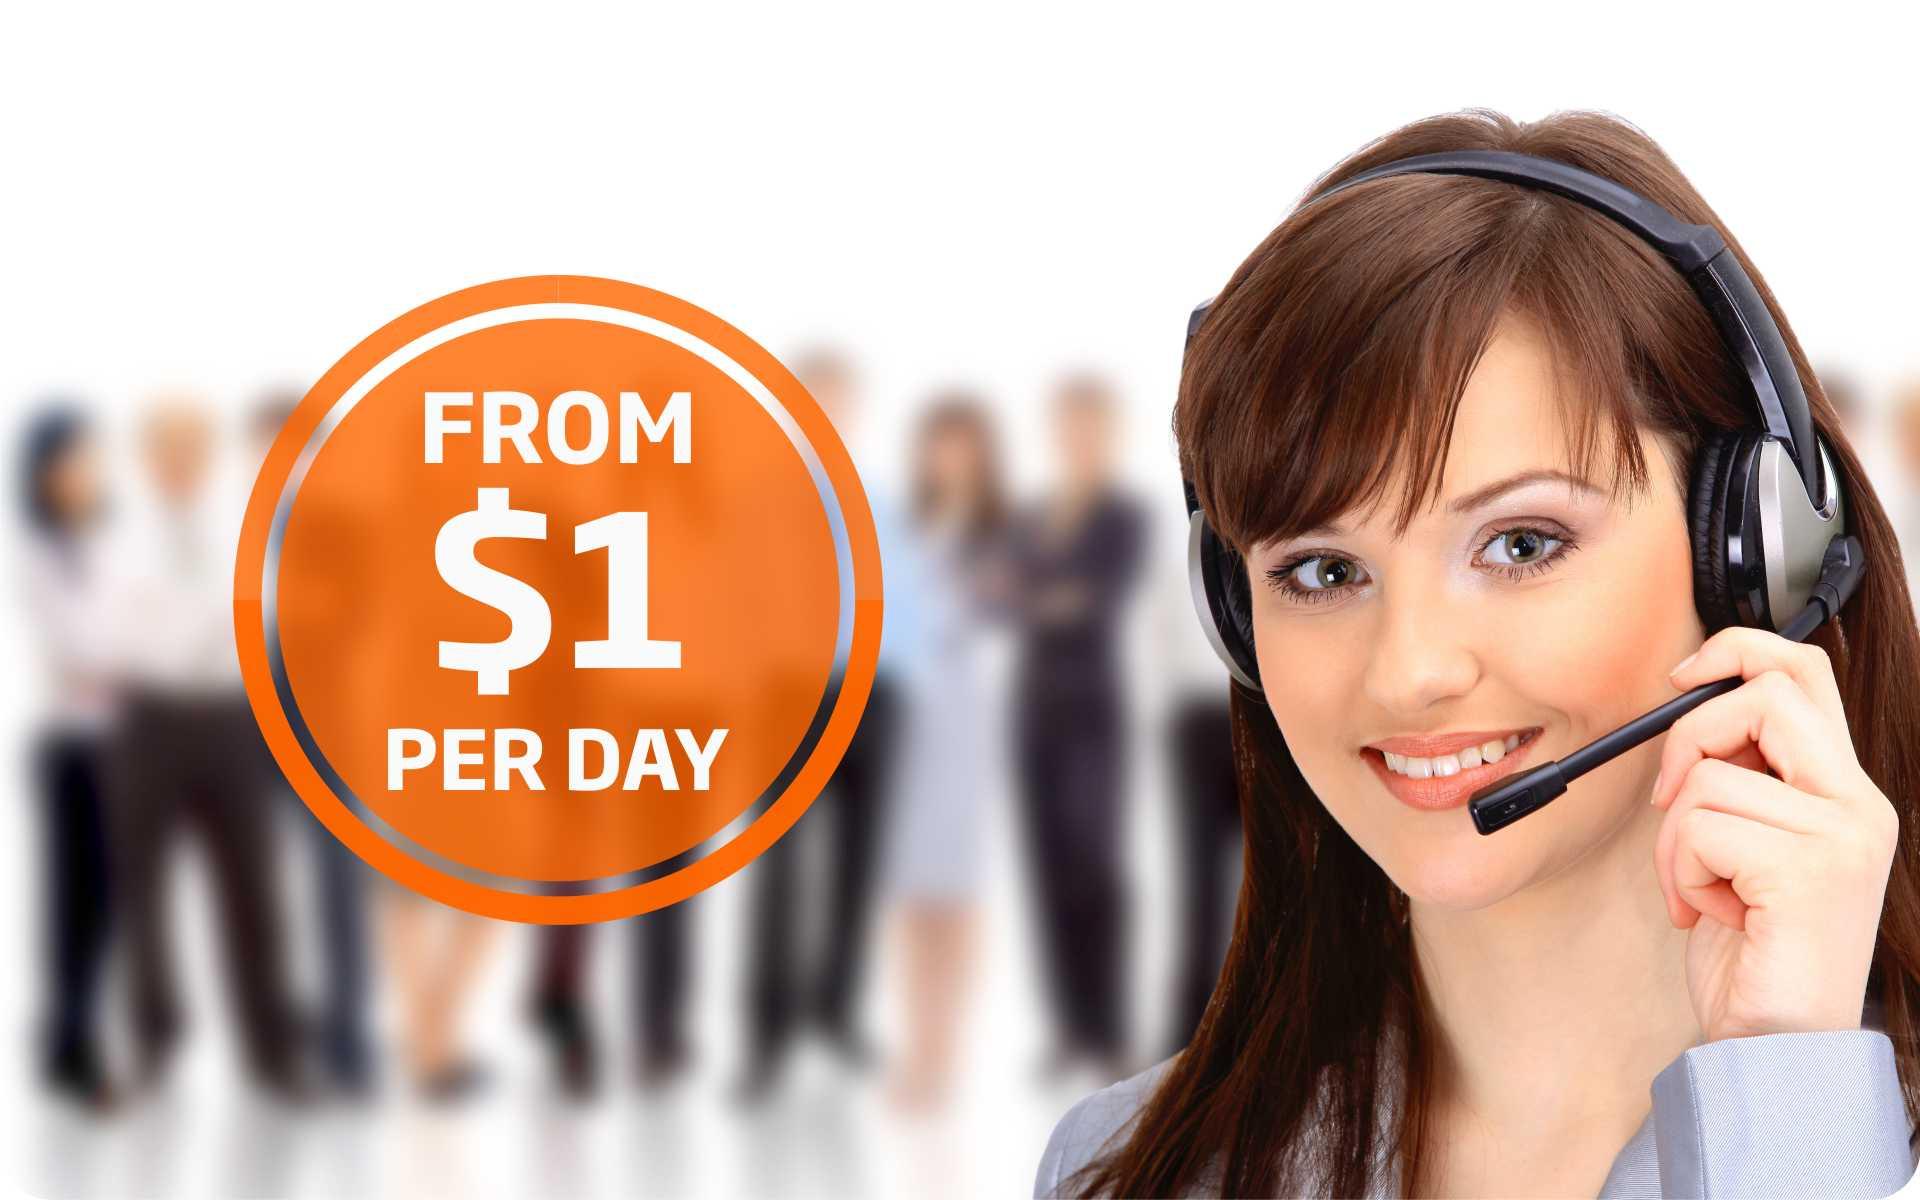 telephone-answering-services-live-phone-answering-service-australia-B247-140418.jpg